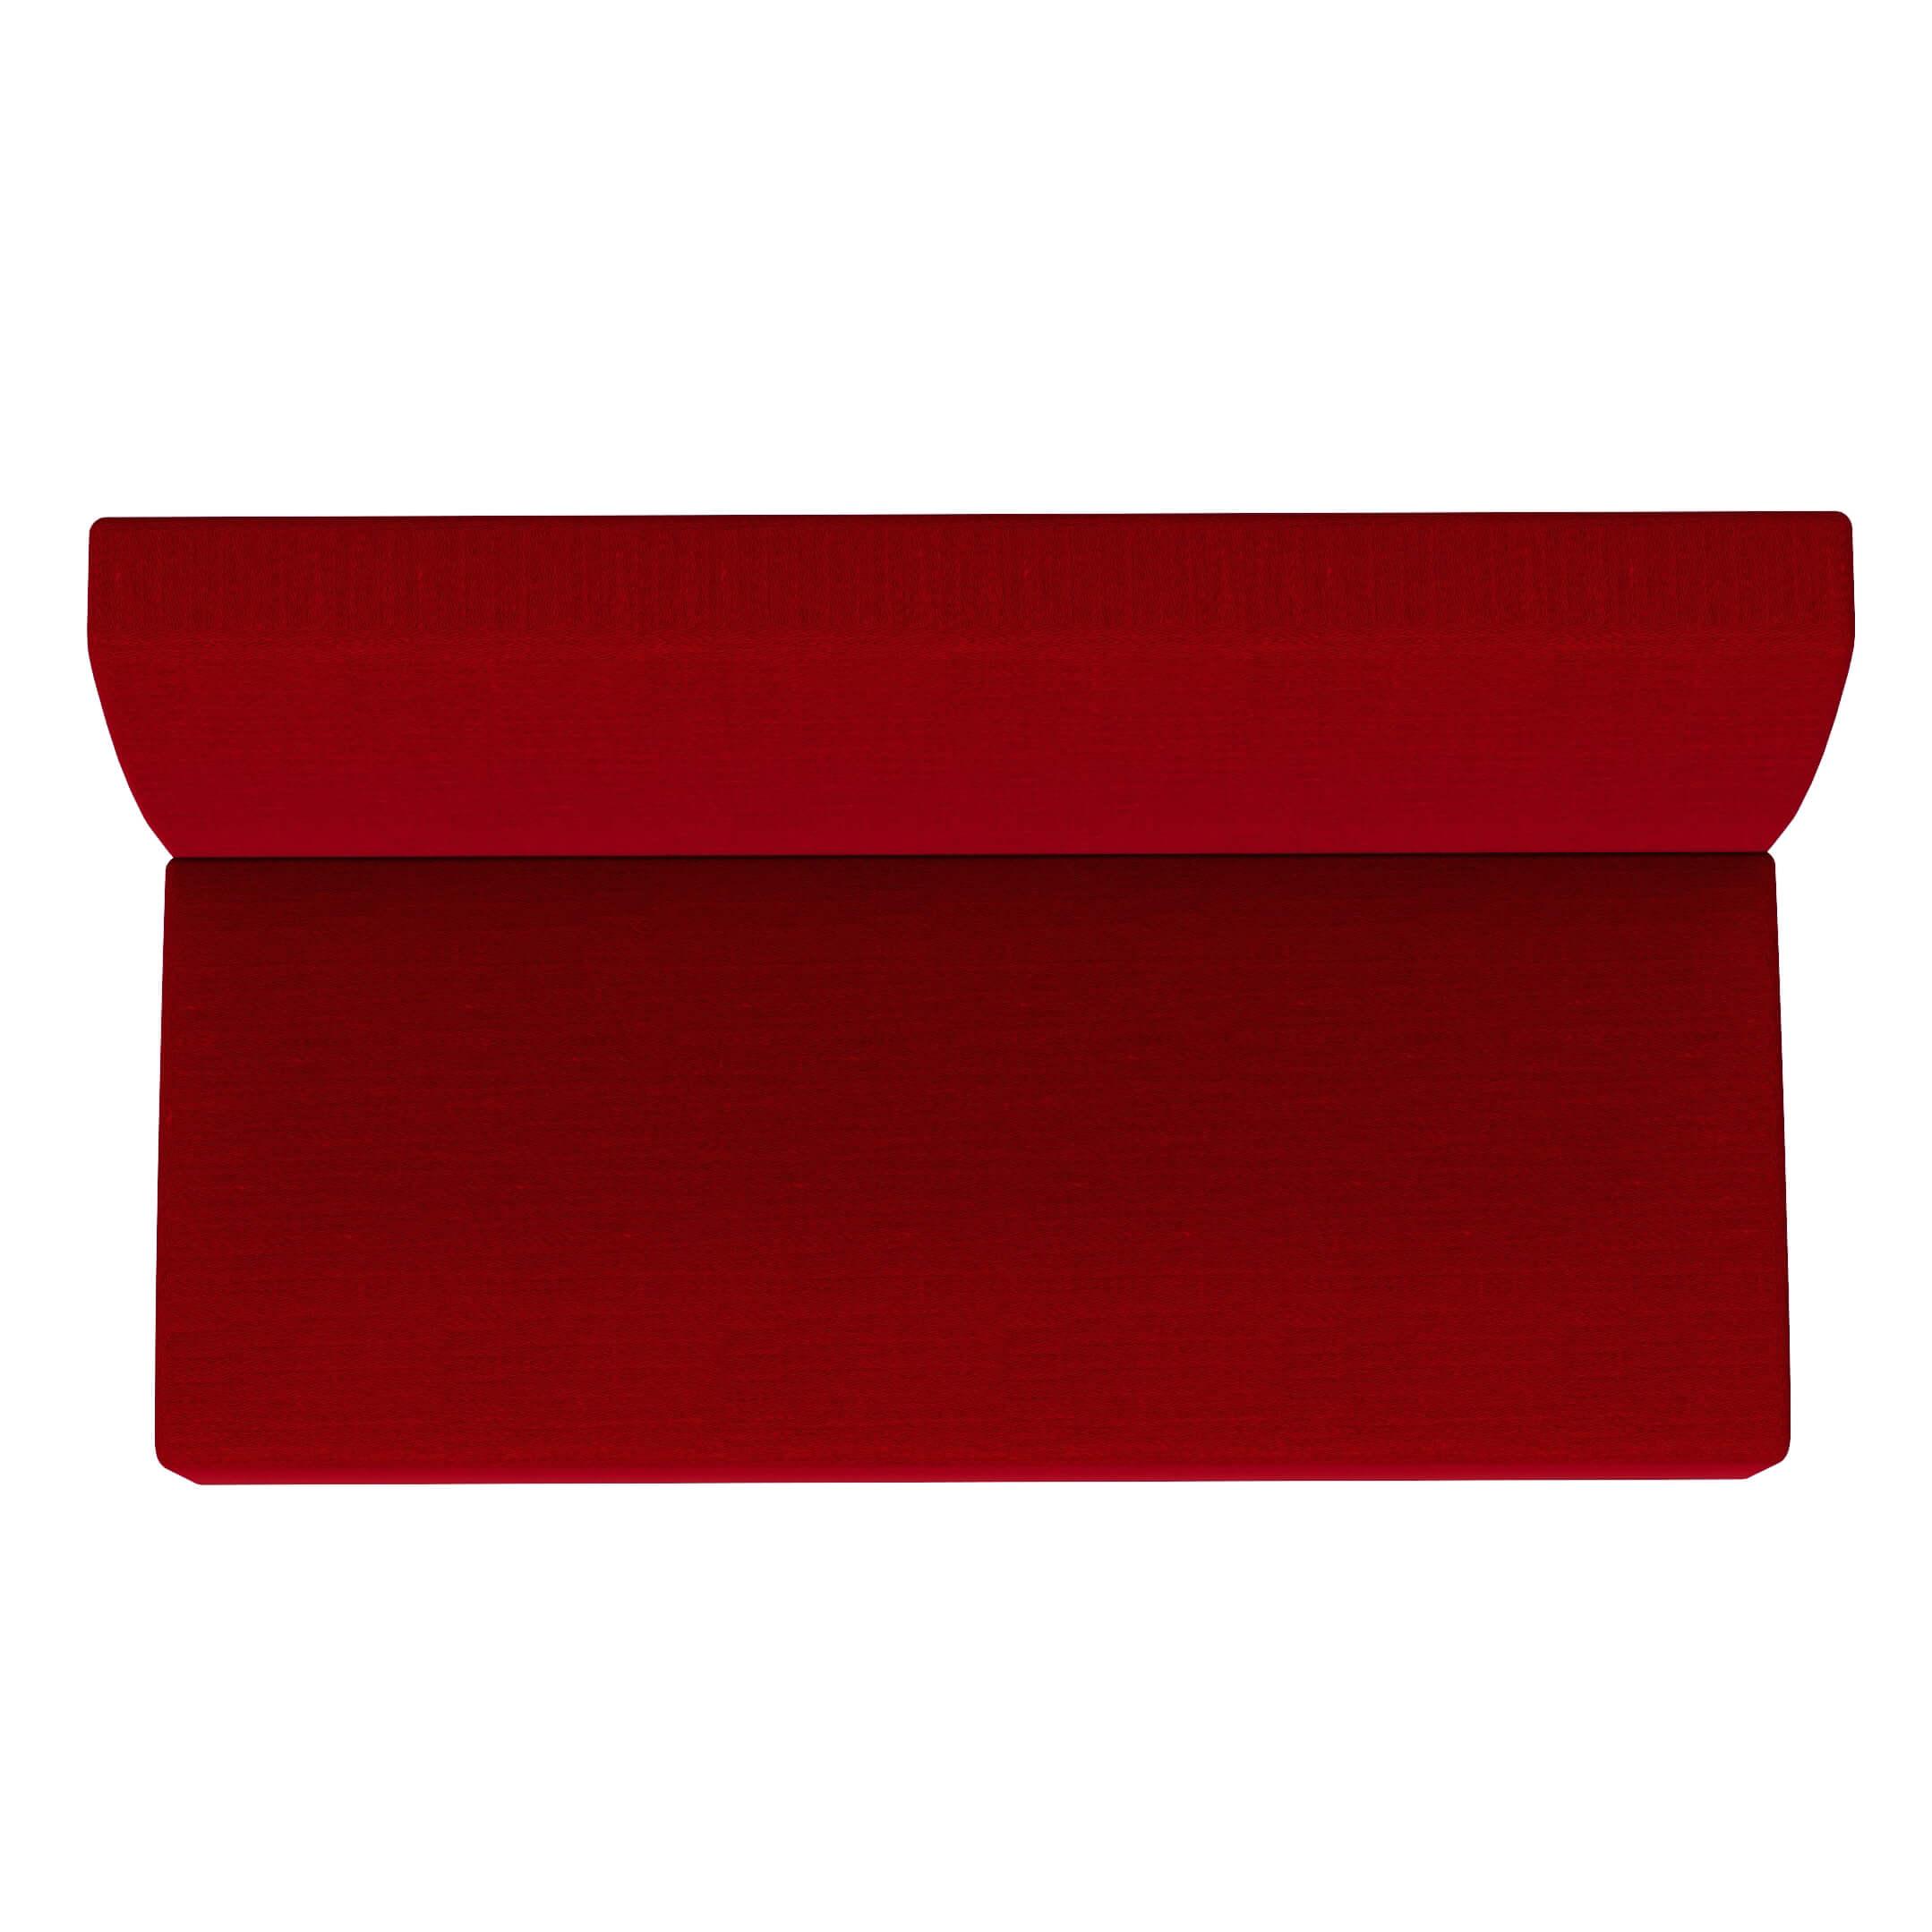 RED MELANGE LOW BACK BENCH FABRICS